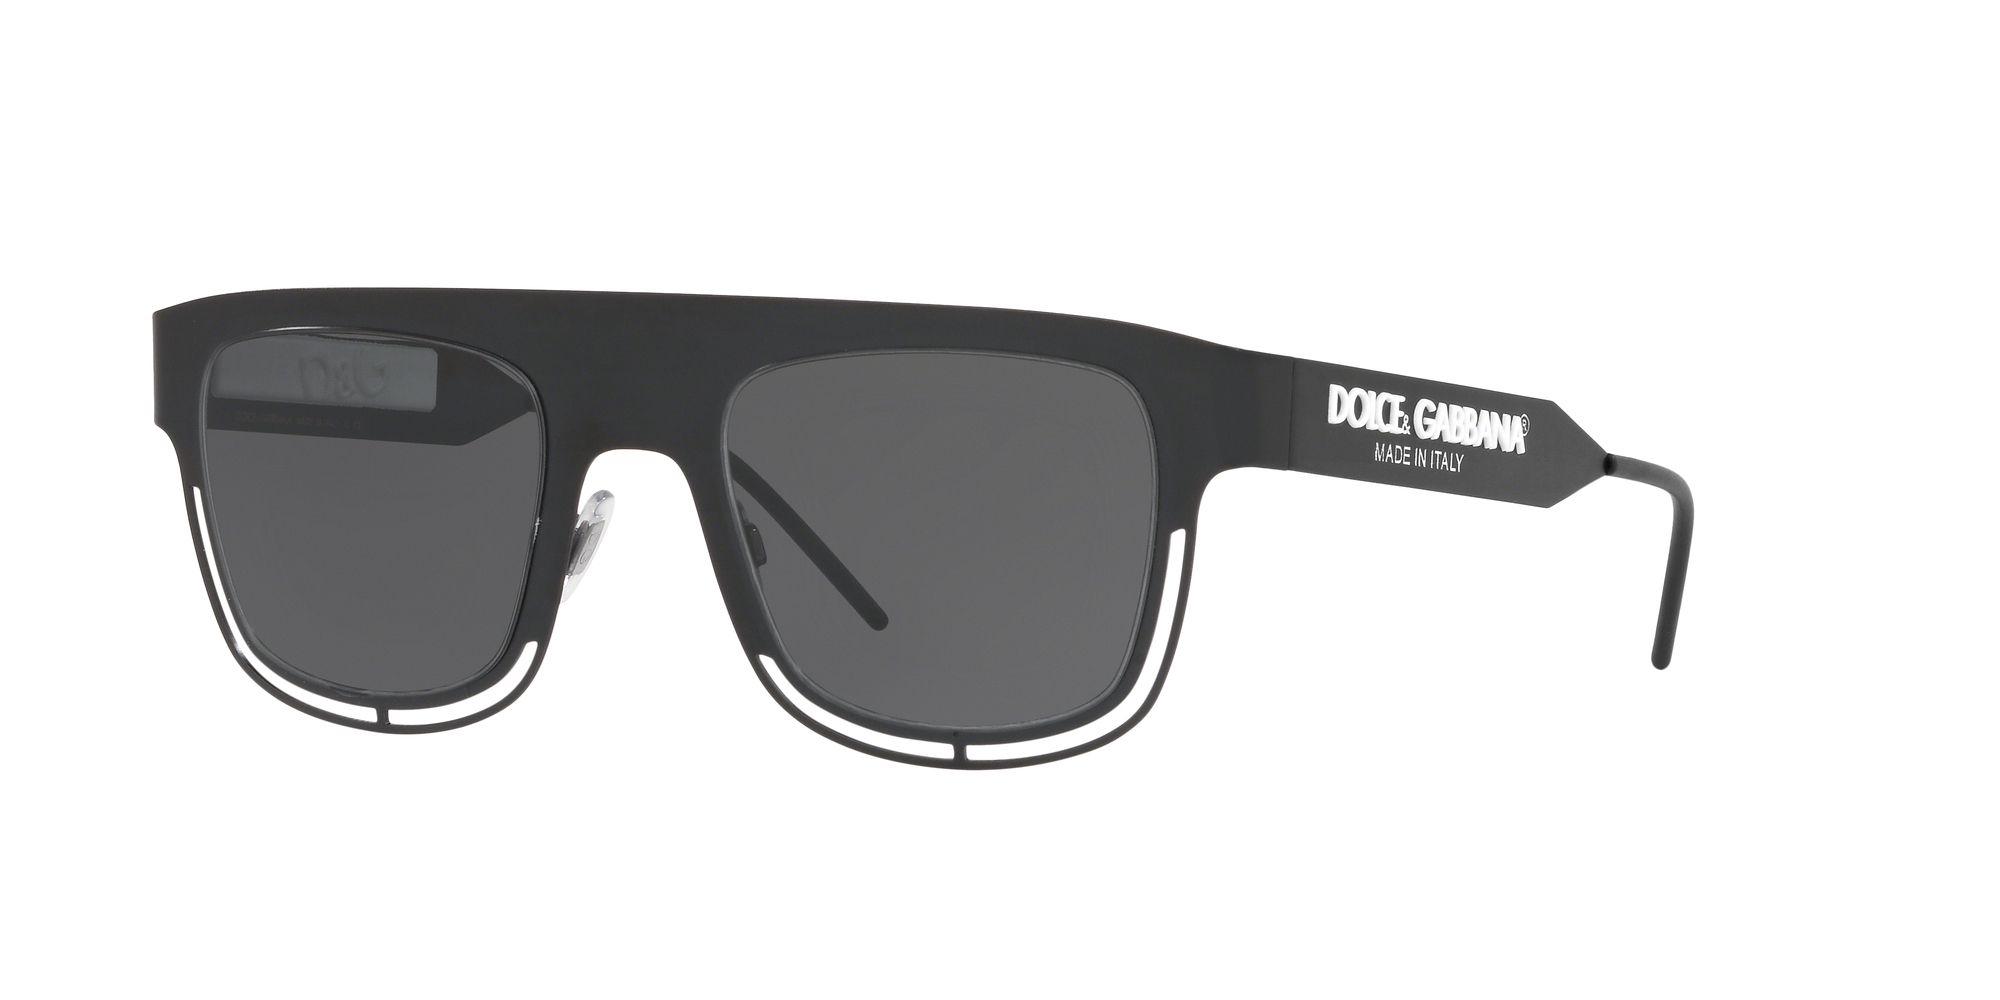 Dolce & Gabbana Dolce & Gabbana DG2232 Men's Square Sunglasses